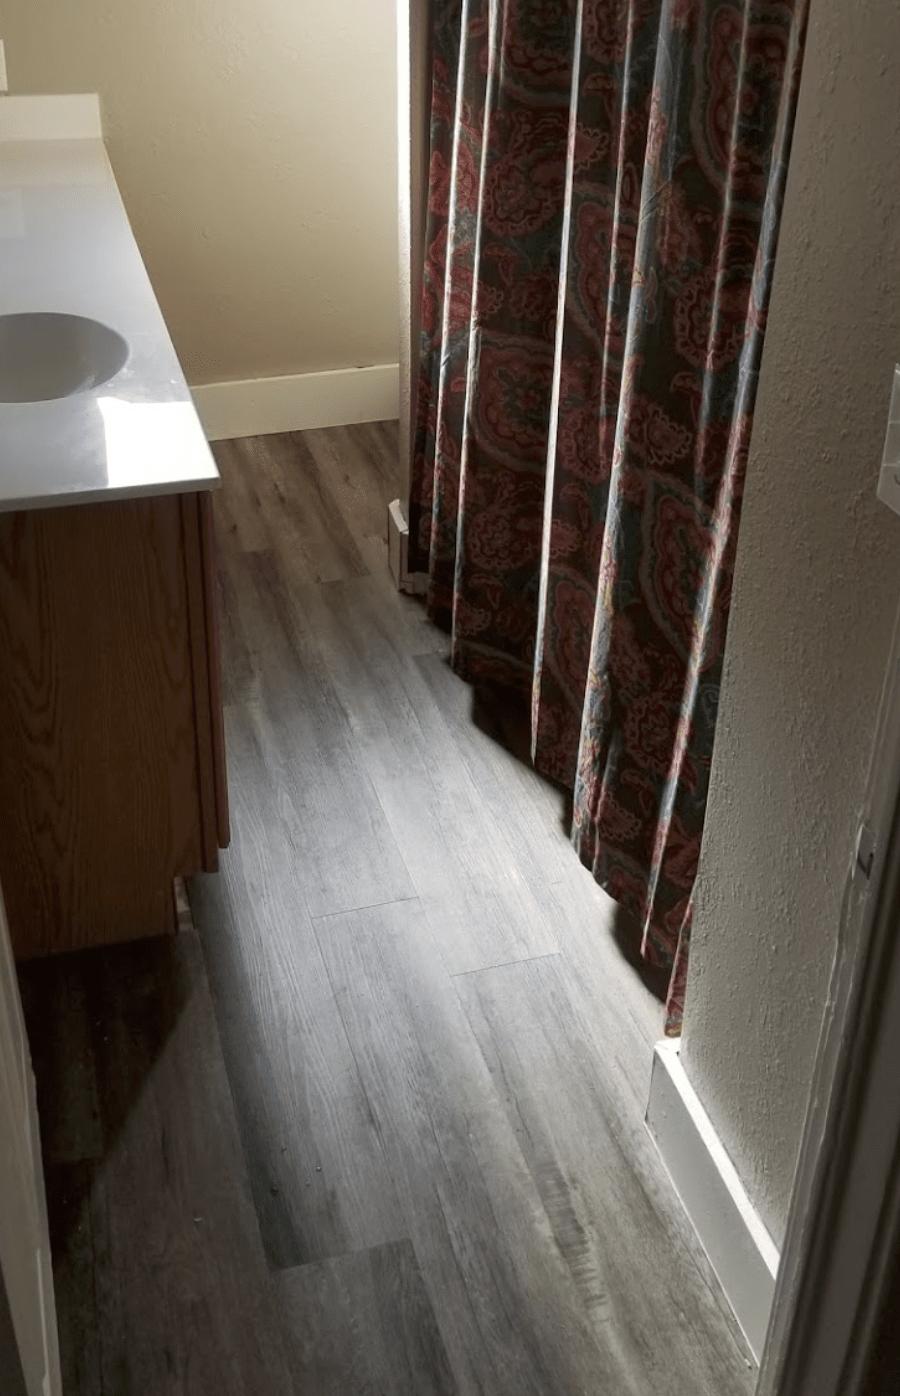 Vinyl plank flooring from Taylors Flooring in Scottsdale, AZ